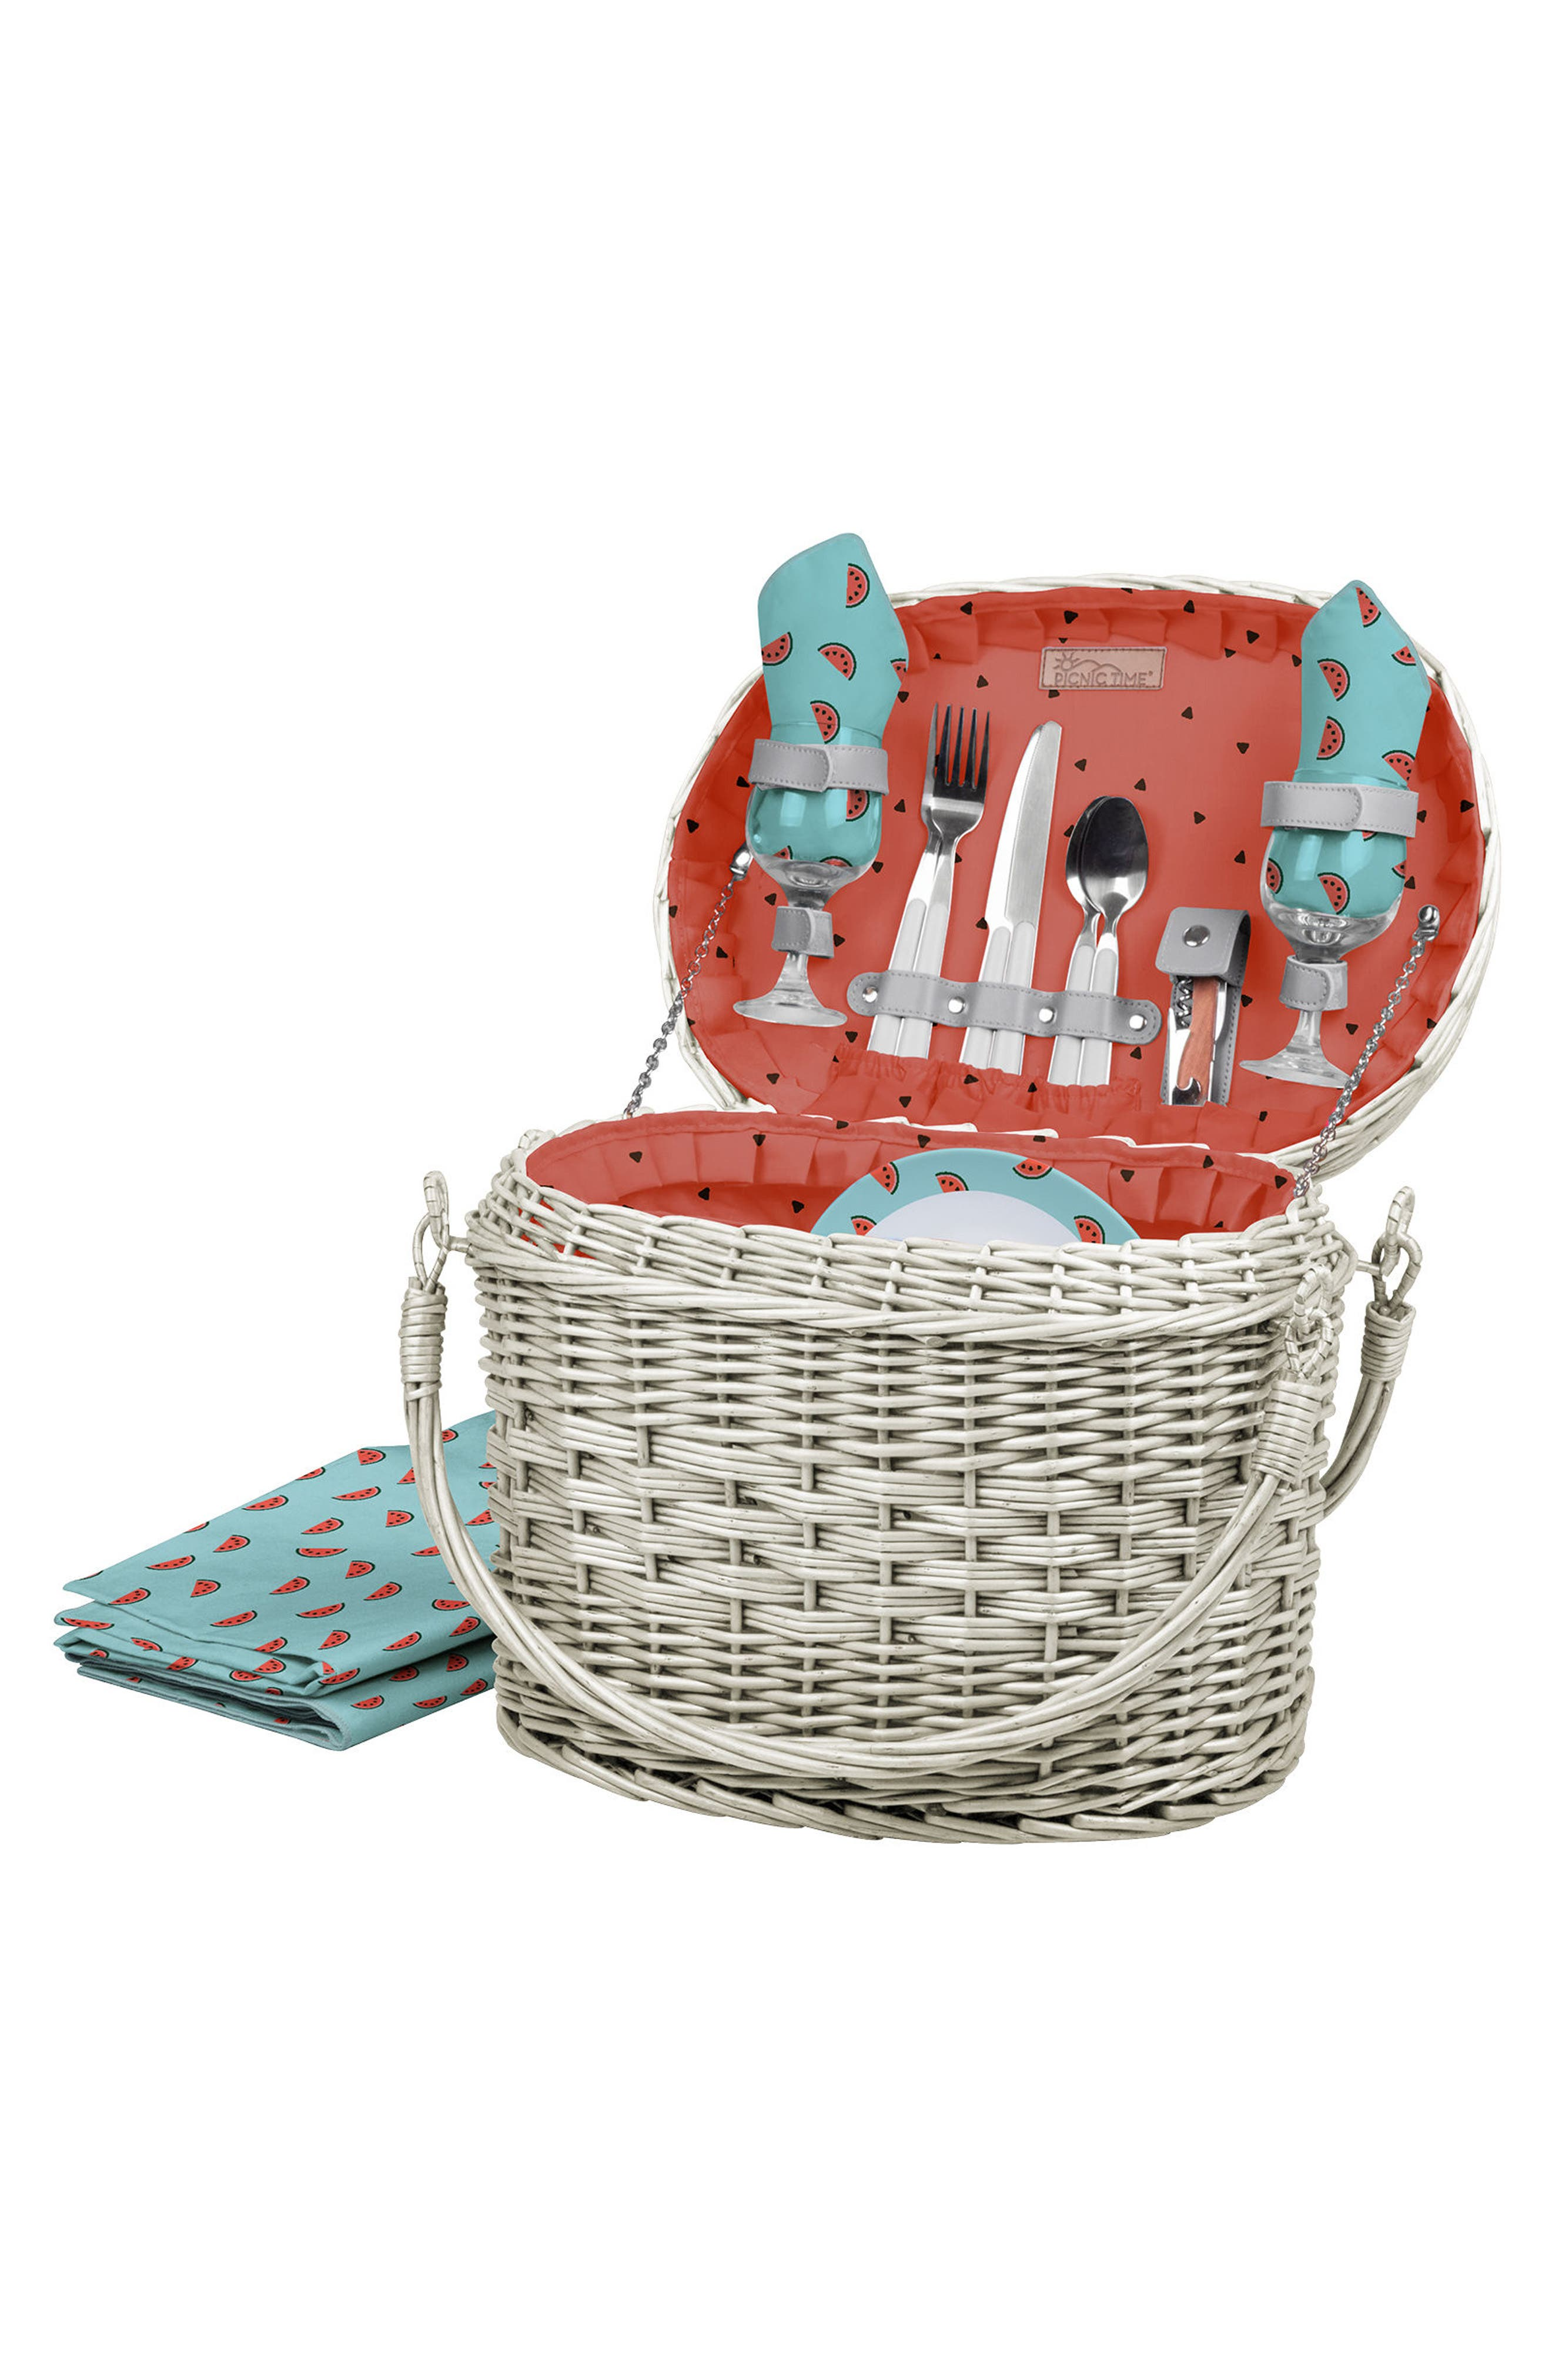 Romance Picnic Basket,                             Alternate thumbnail 2, color,                             400